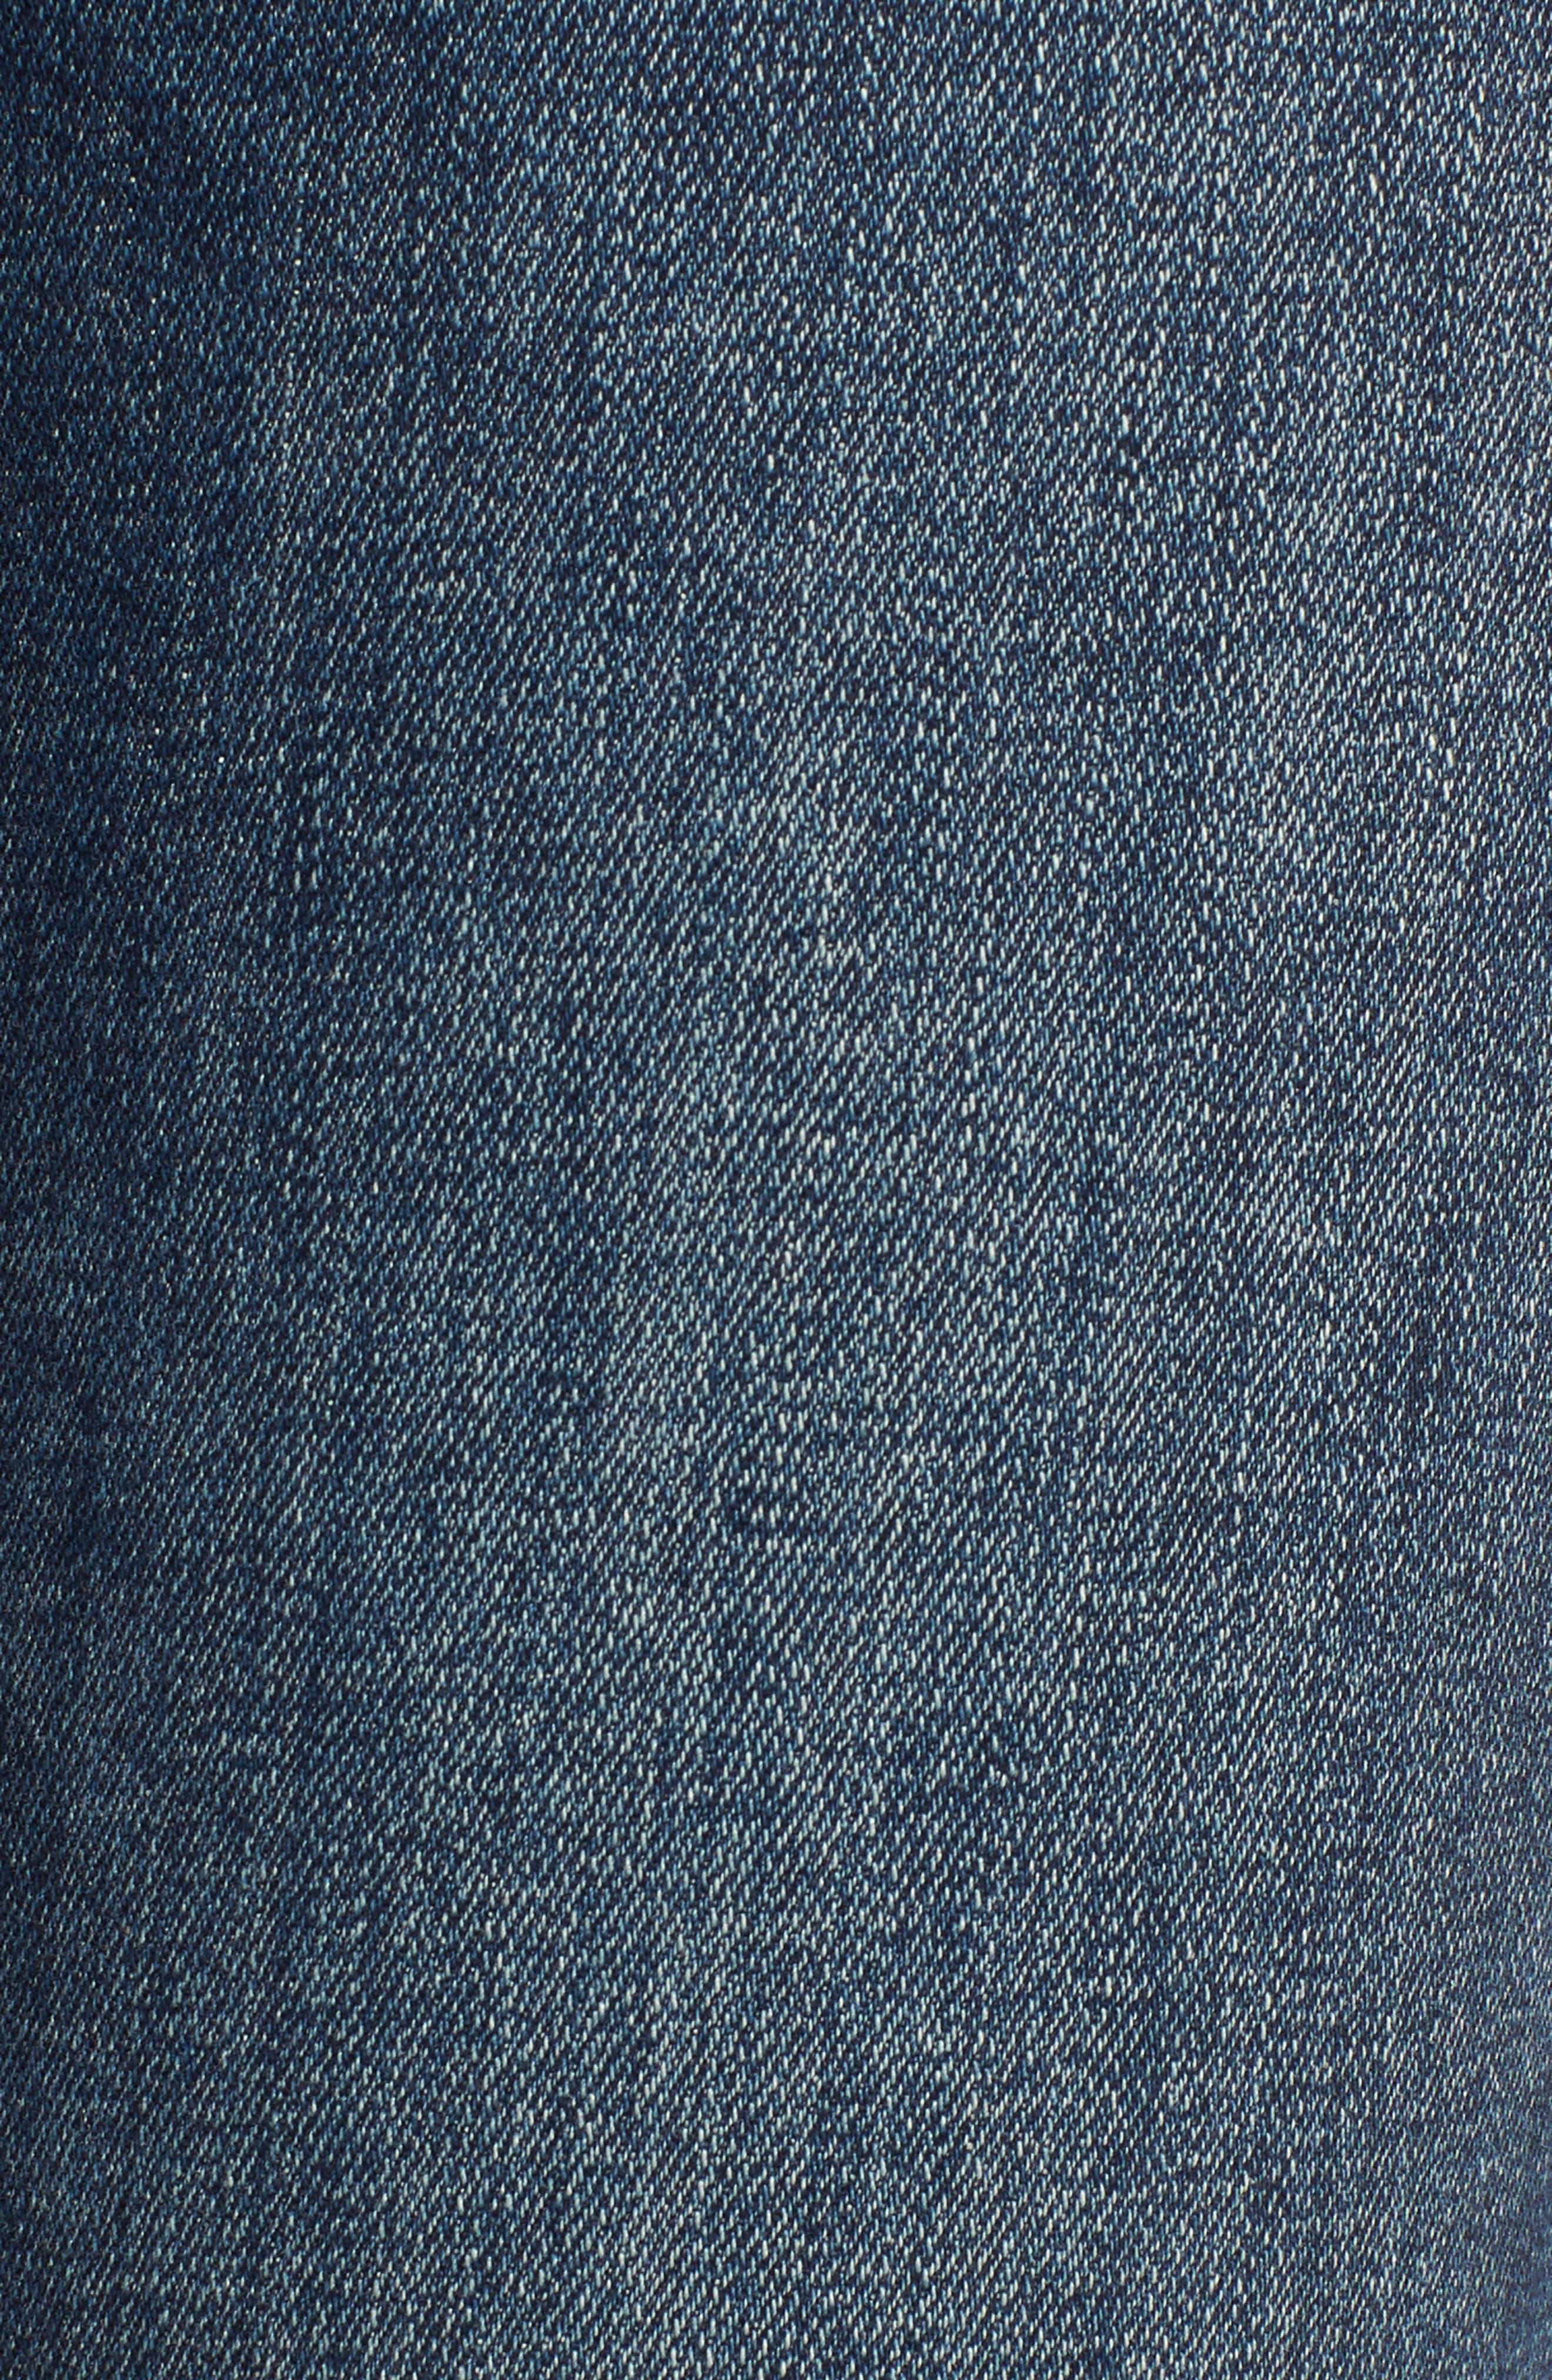 Stevie Ripped Crop Slim Boyfriend Jeans,                             Alternate thumbnail 6, color,                             HAWLEY